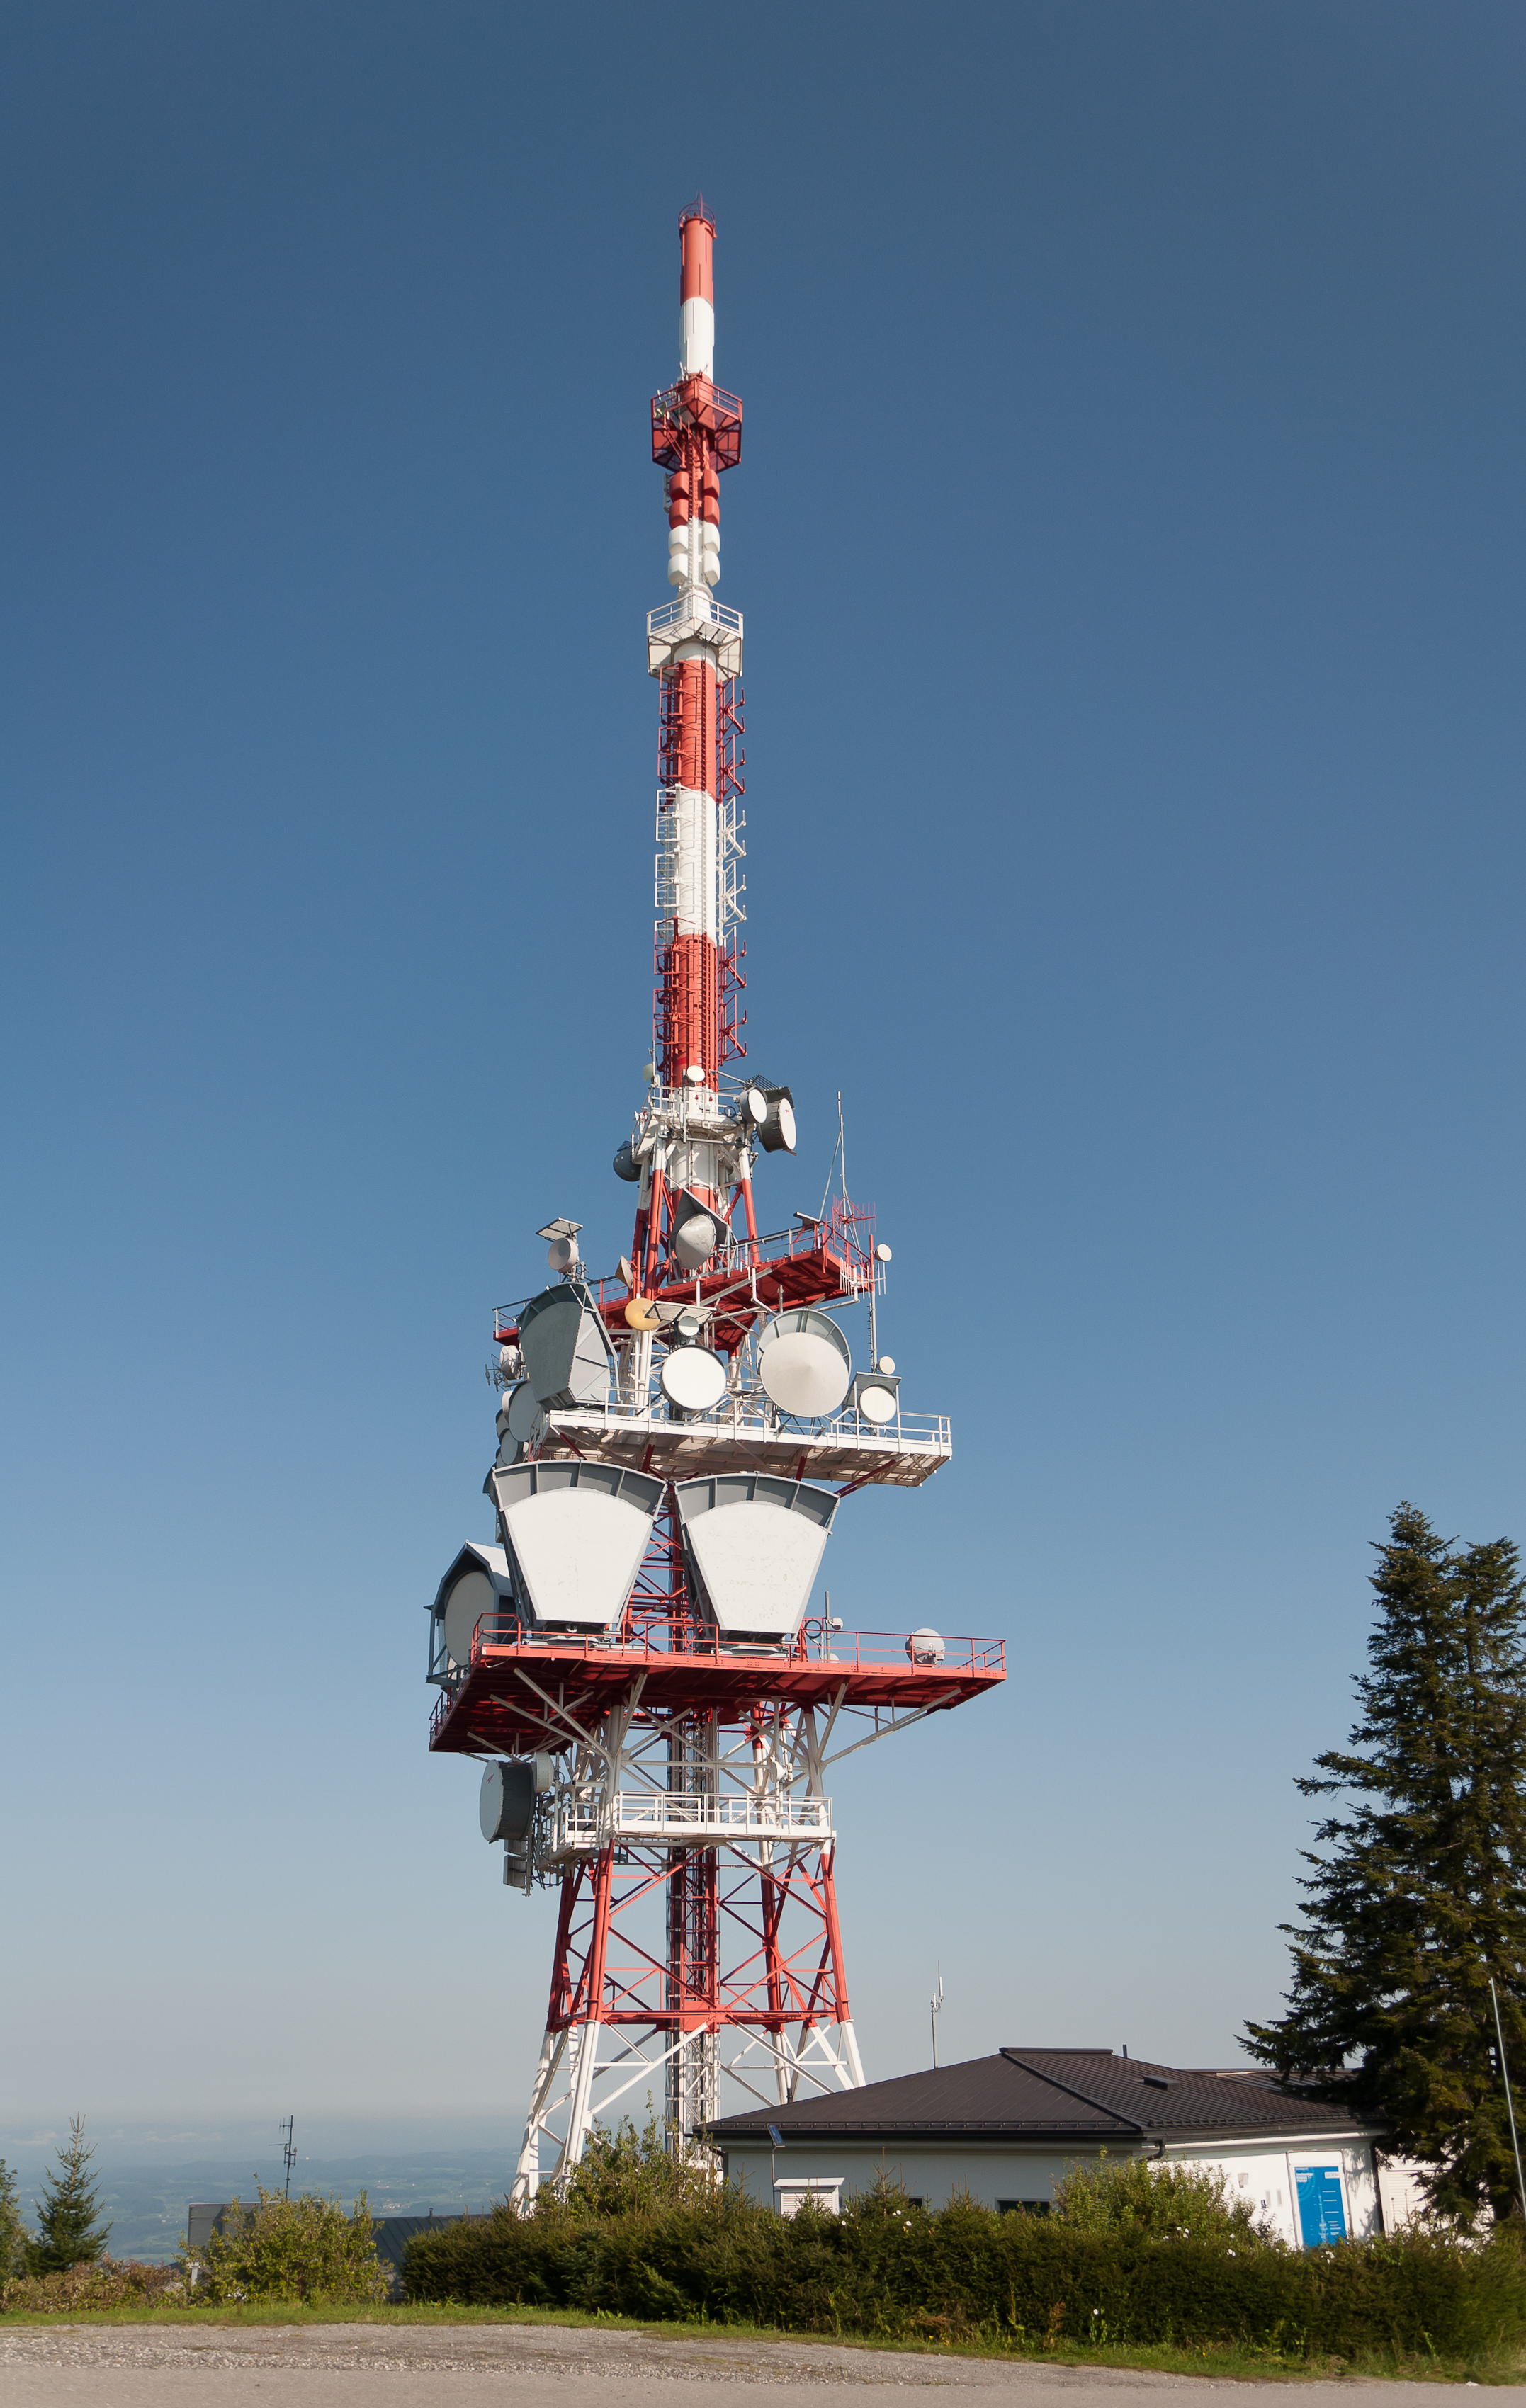 File:Pfänder radio tower.jpg - Wikimedia Commons: commons.wikimedia.org/wiki/File:Pfänder_radio_tower.jpg